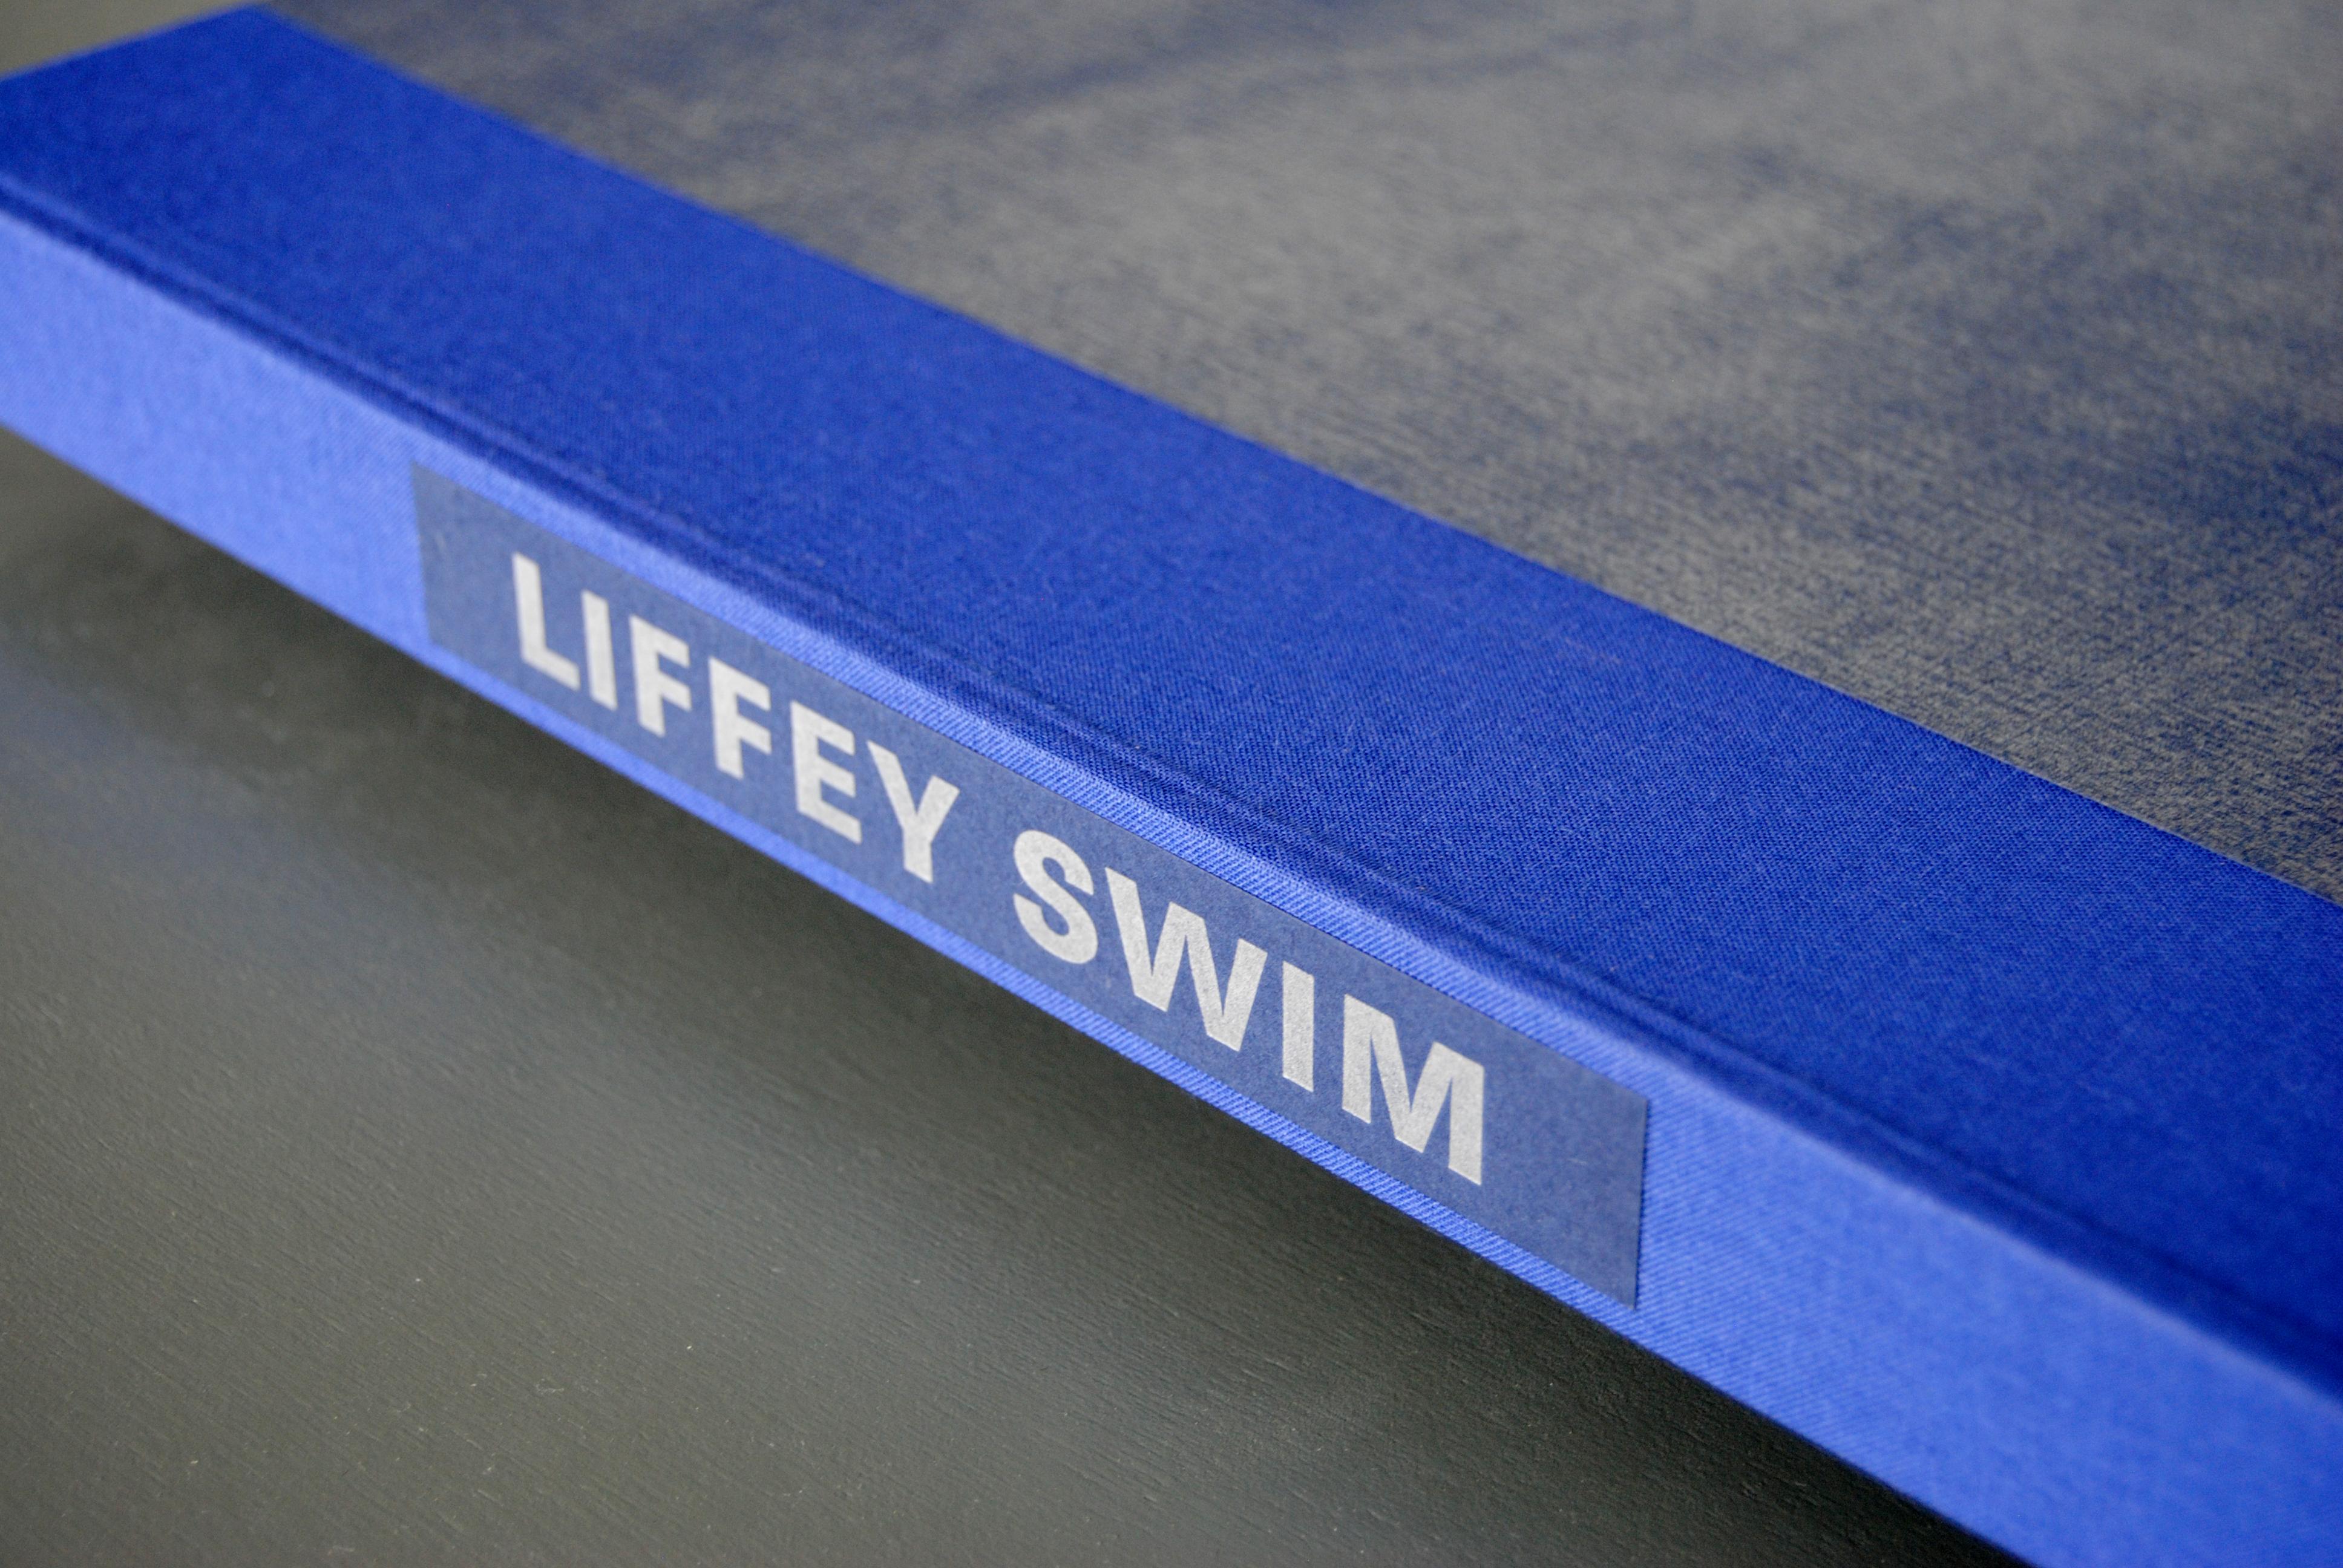 Cover image: Liffey Swim